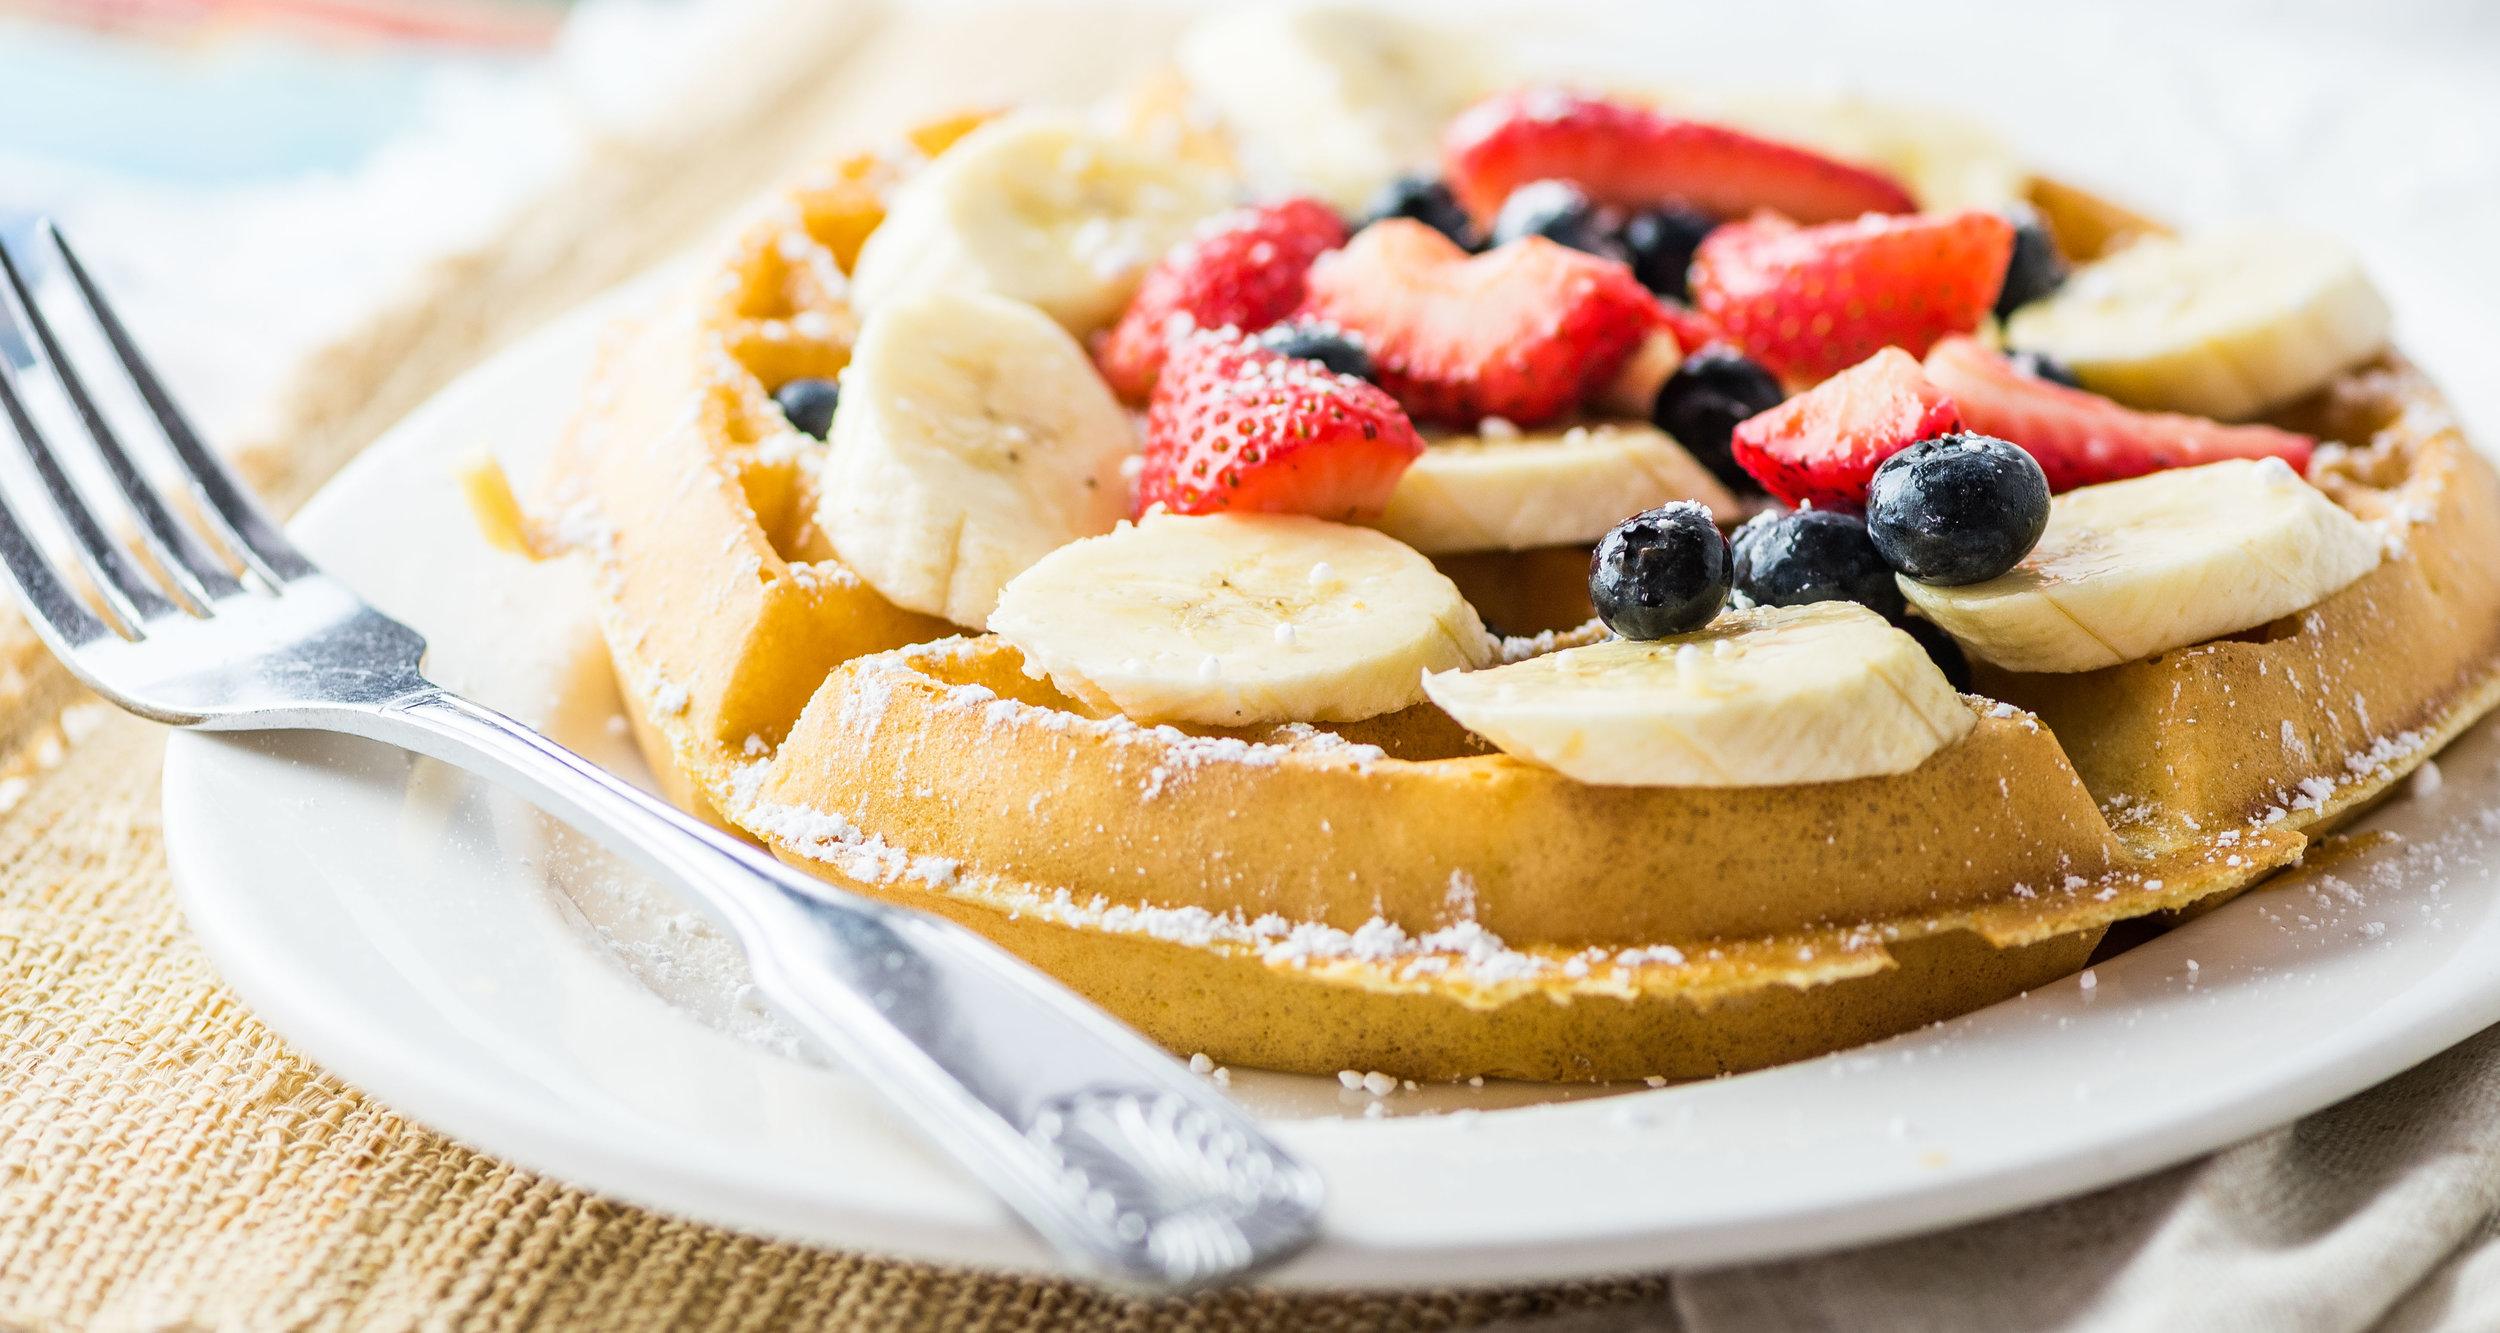 Breakfast-Sara_s Kitchen-Belgian Waffle-8887.jpg